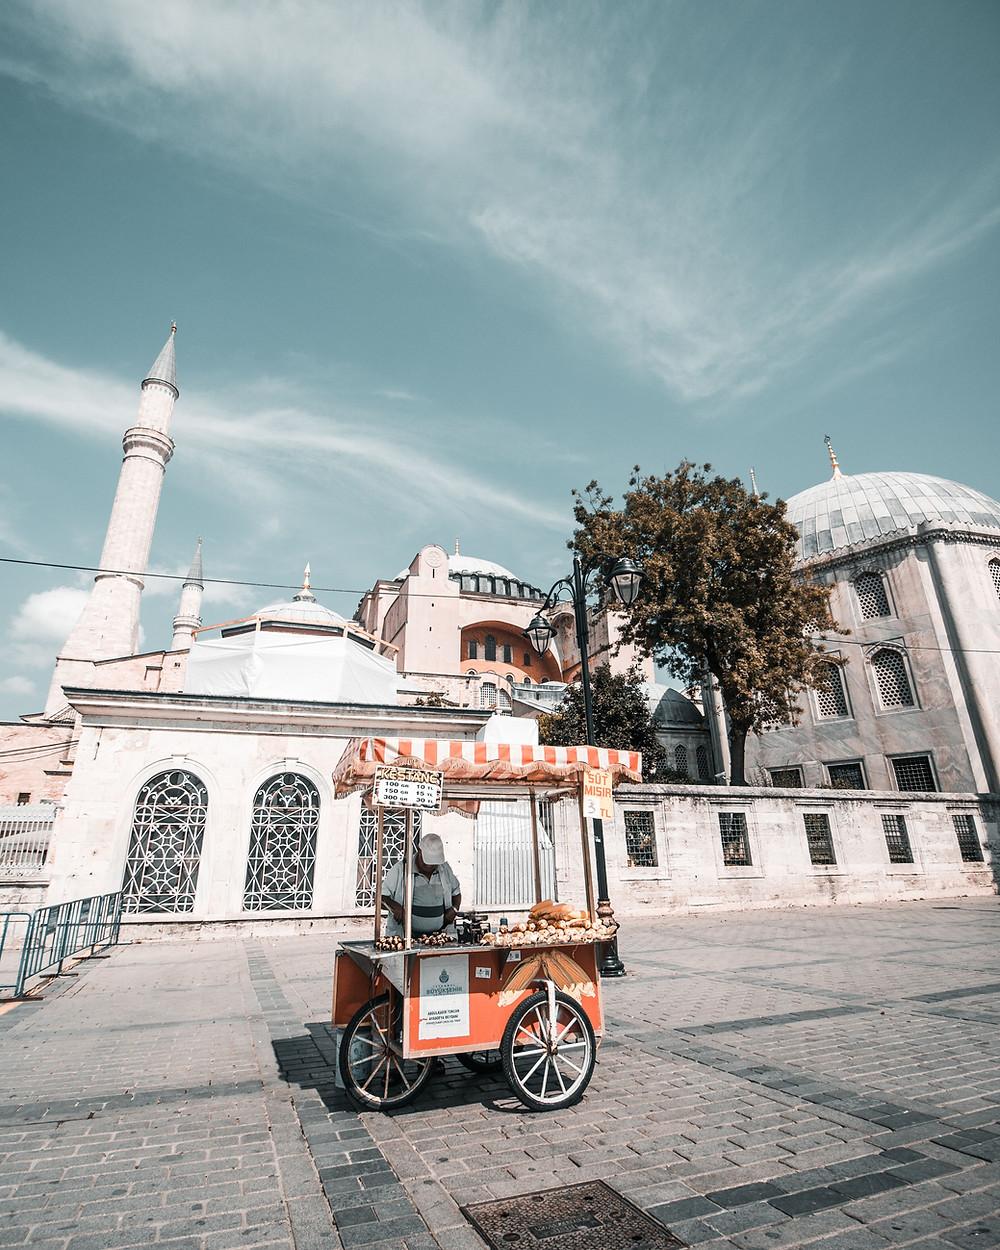 Торговец кукурузой и жареными каштанами, Стамбул, Турция